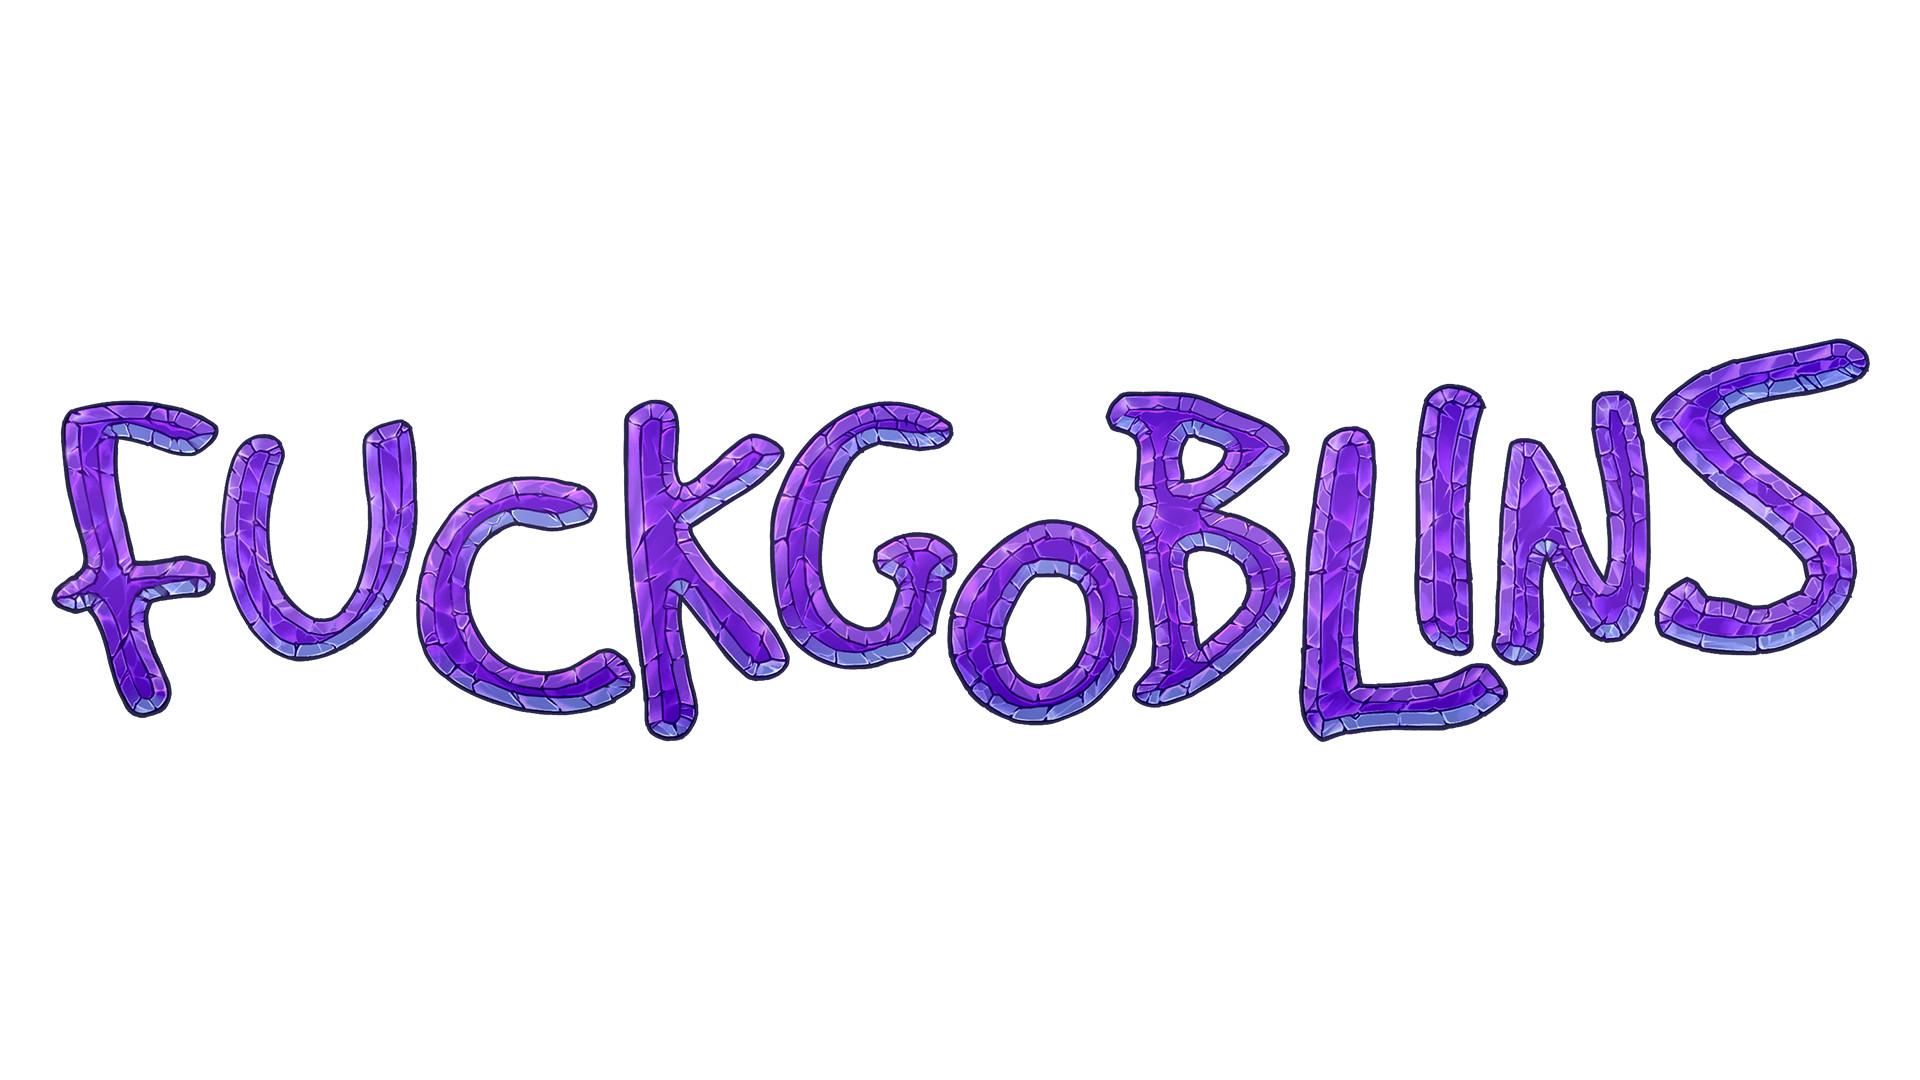 Sal vador thedarkcloak fuckgoblins logo wstroke